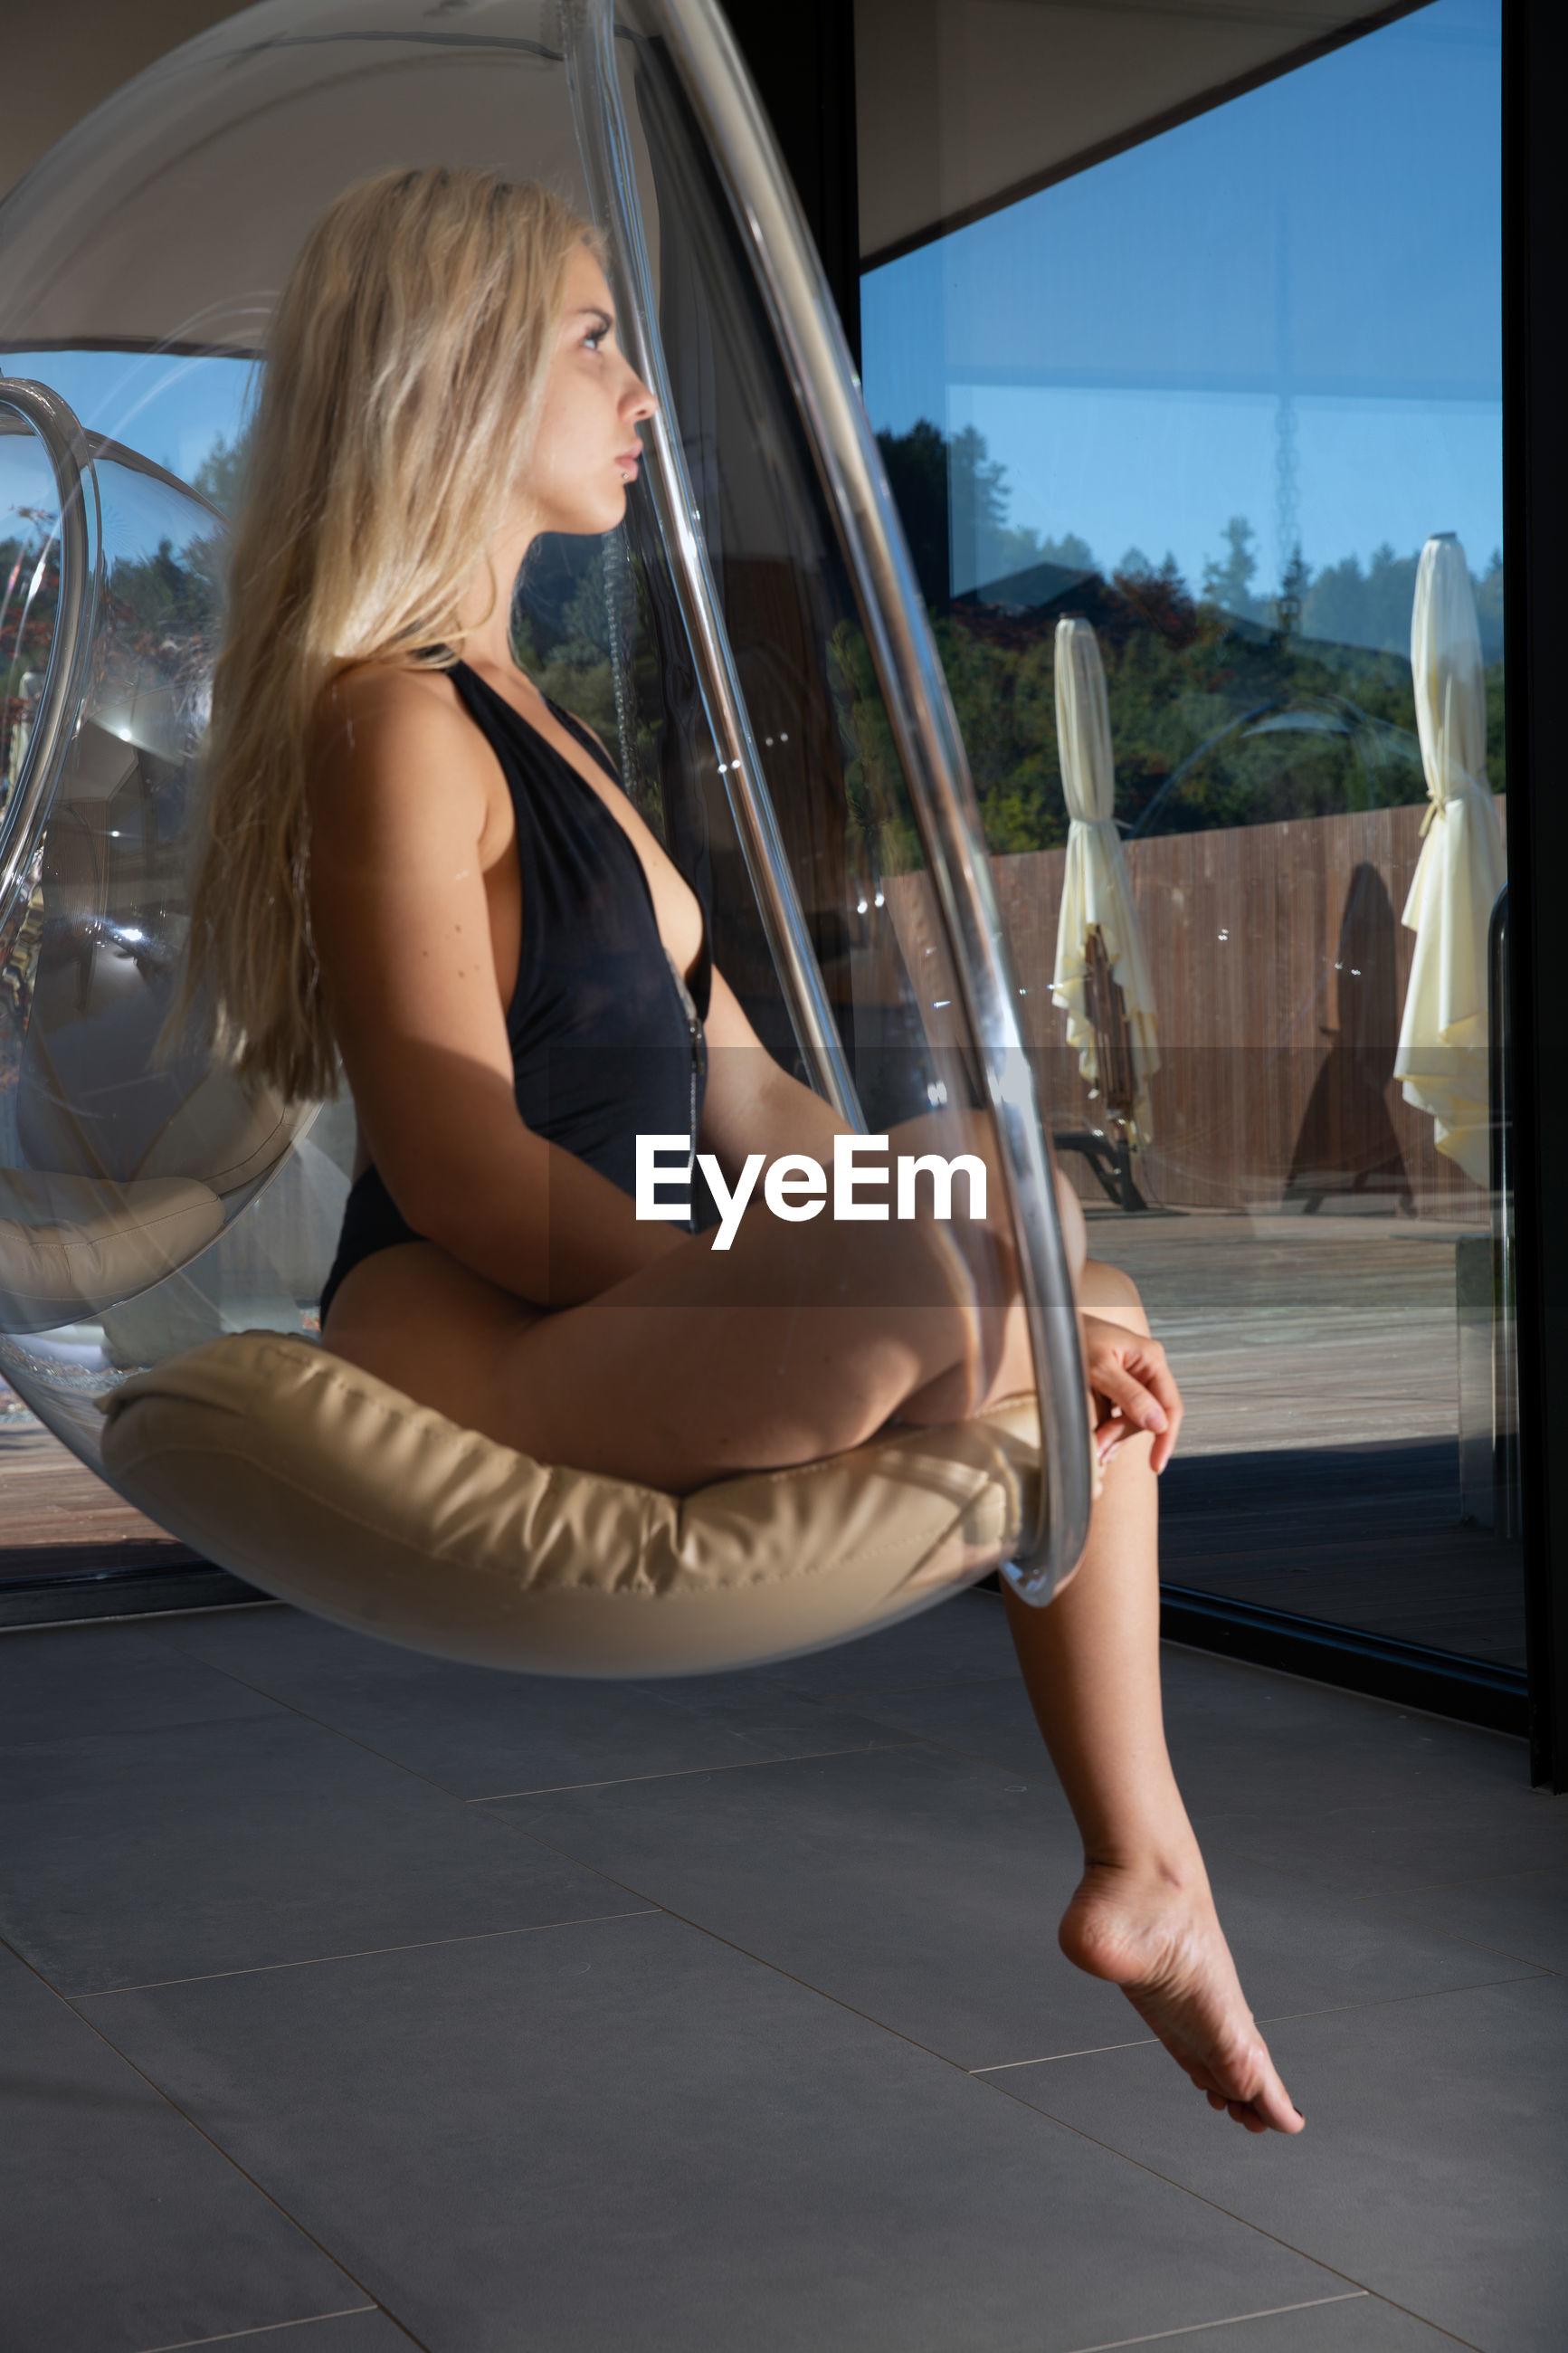 WOMAN SITTING IN GLASS WINDOW OF BUS